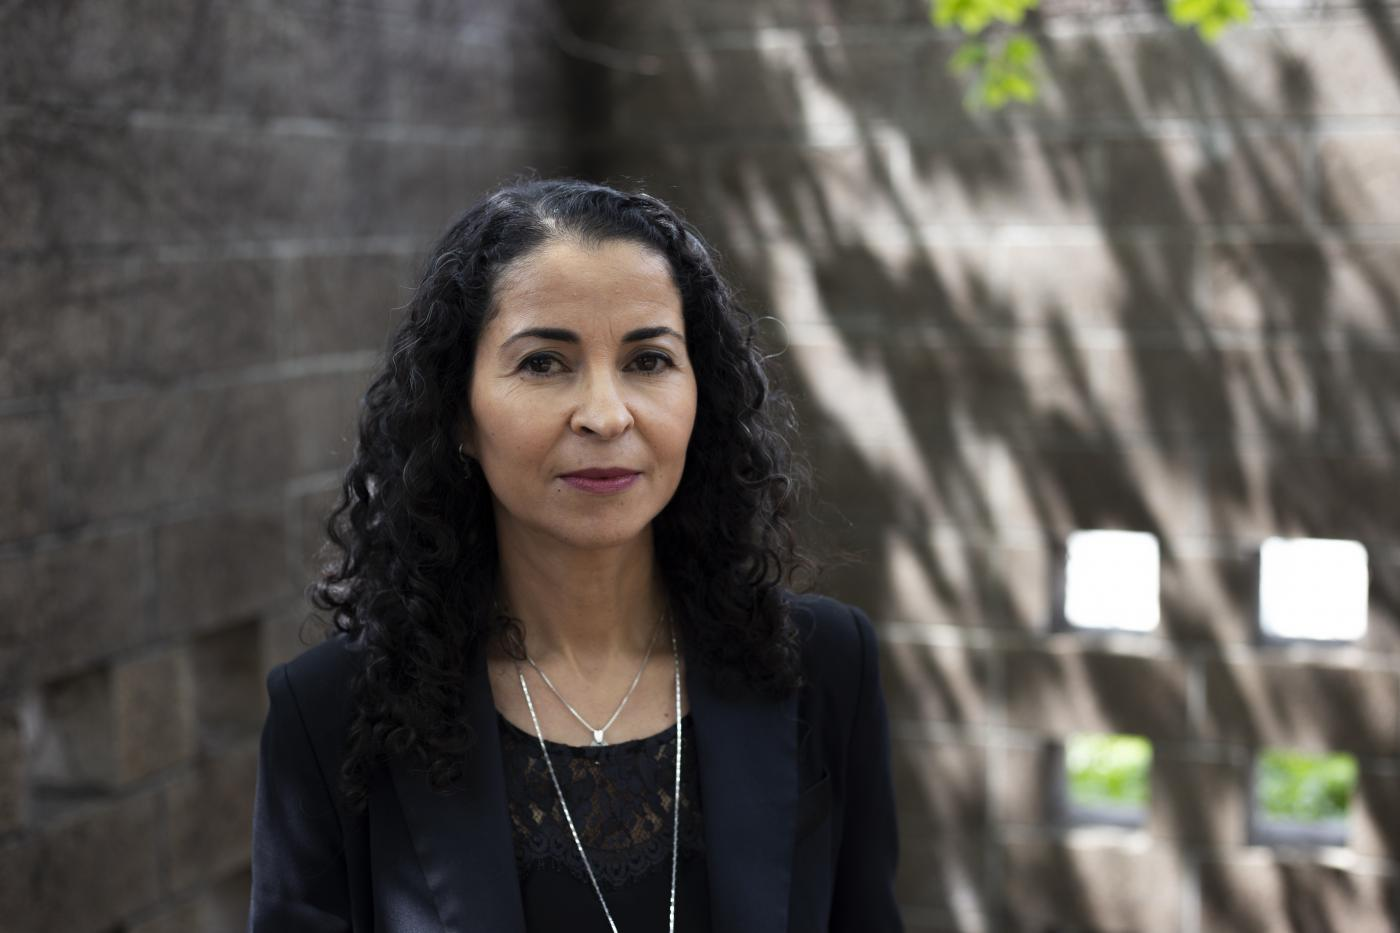 National Book Award: La romancière marocaine Laila Lalami finaliste